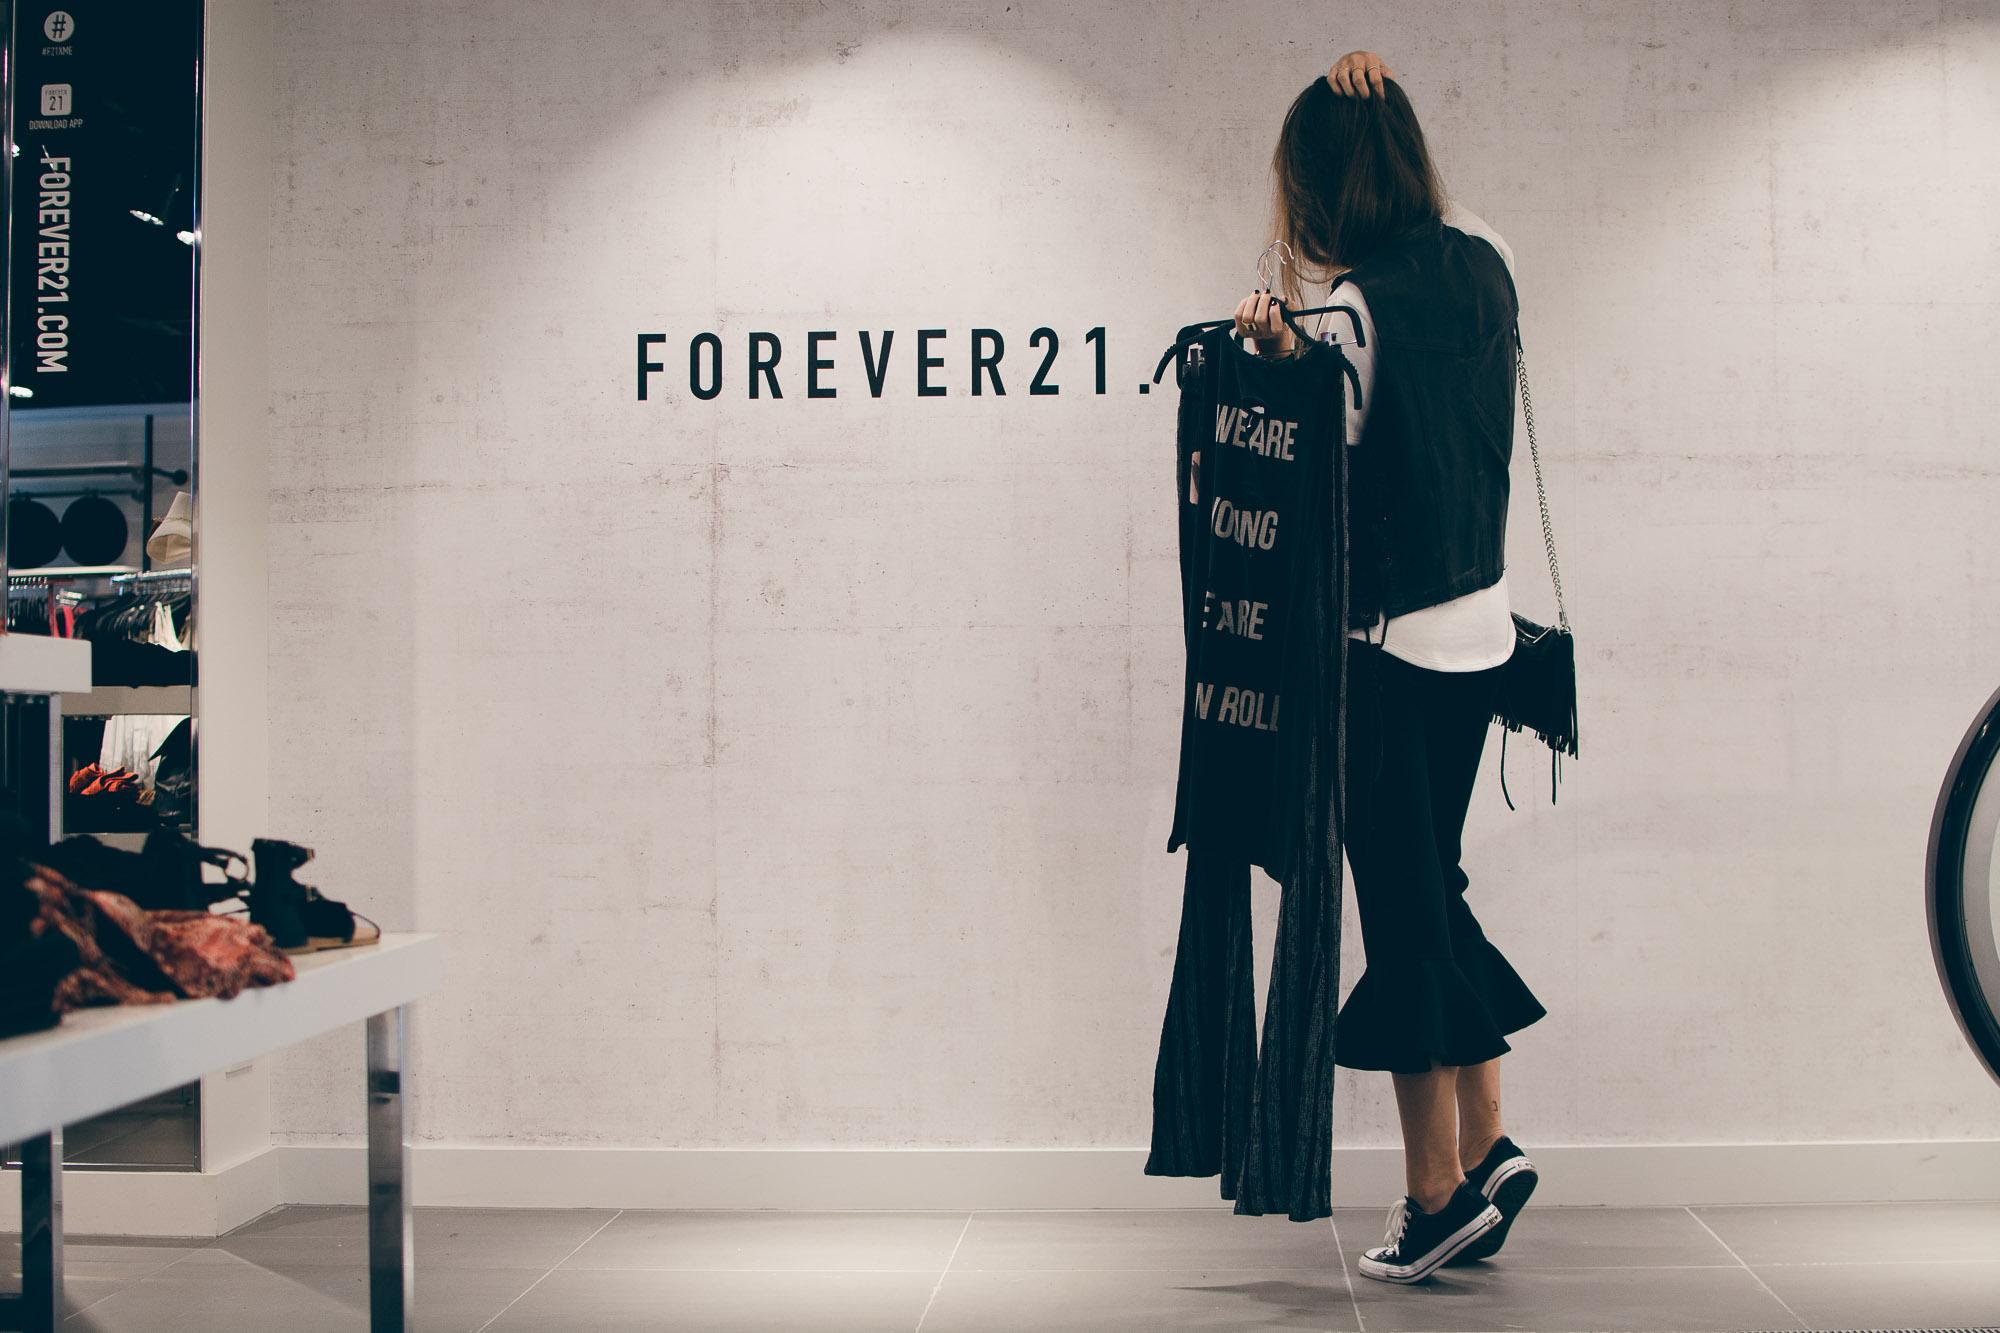 Forever 21 Dortmund Store Opening | Lisa FIege